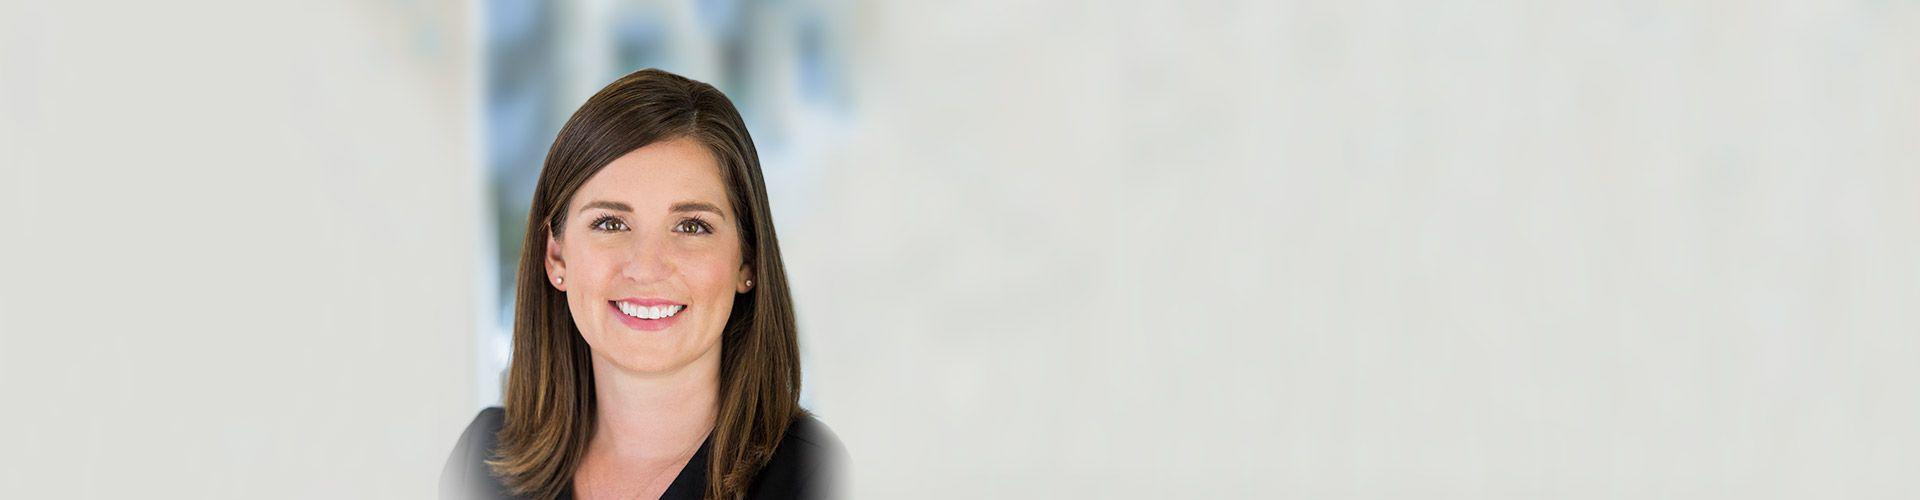 Janelle Harris - Aesthetician